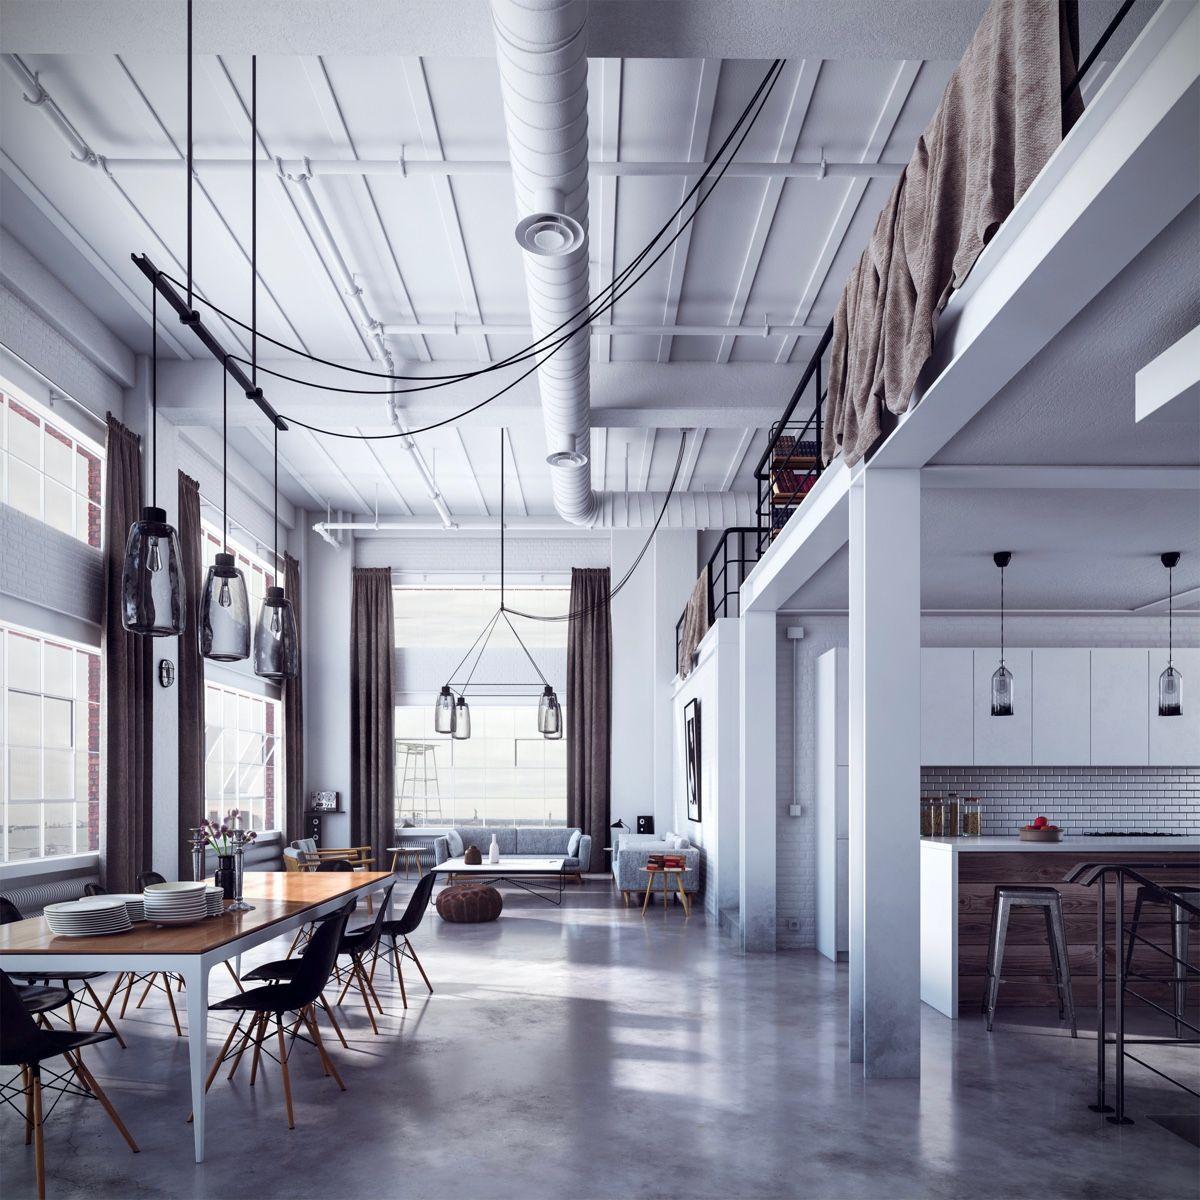 40 Incredible Lofts That Push Boundaries: Collaboration Workspace